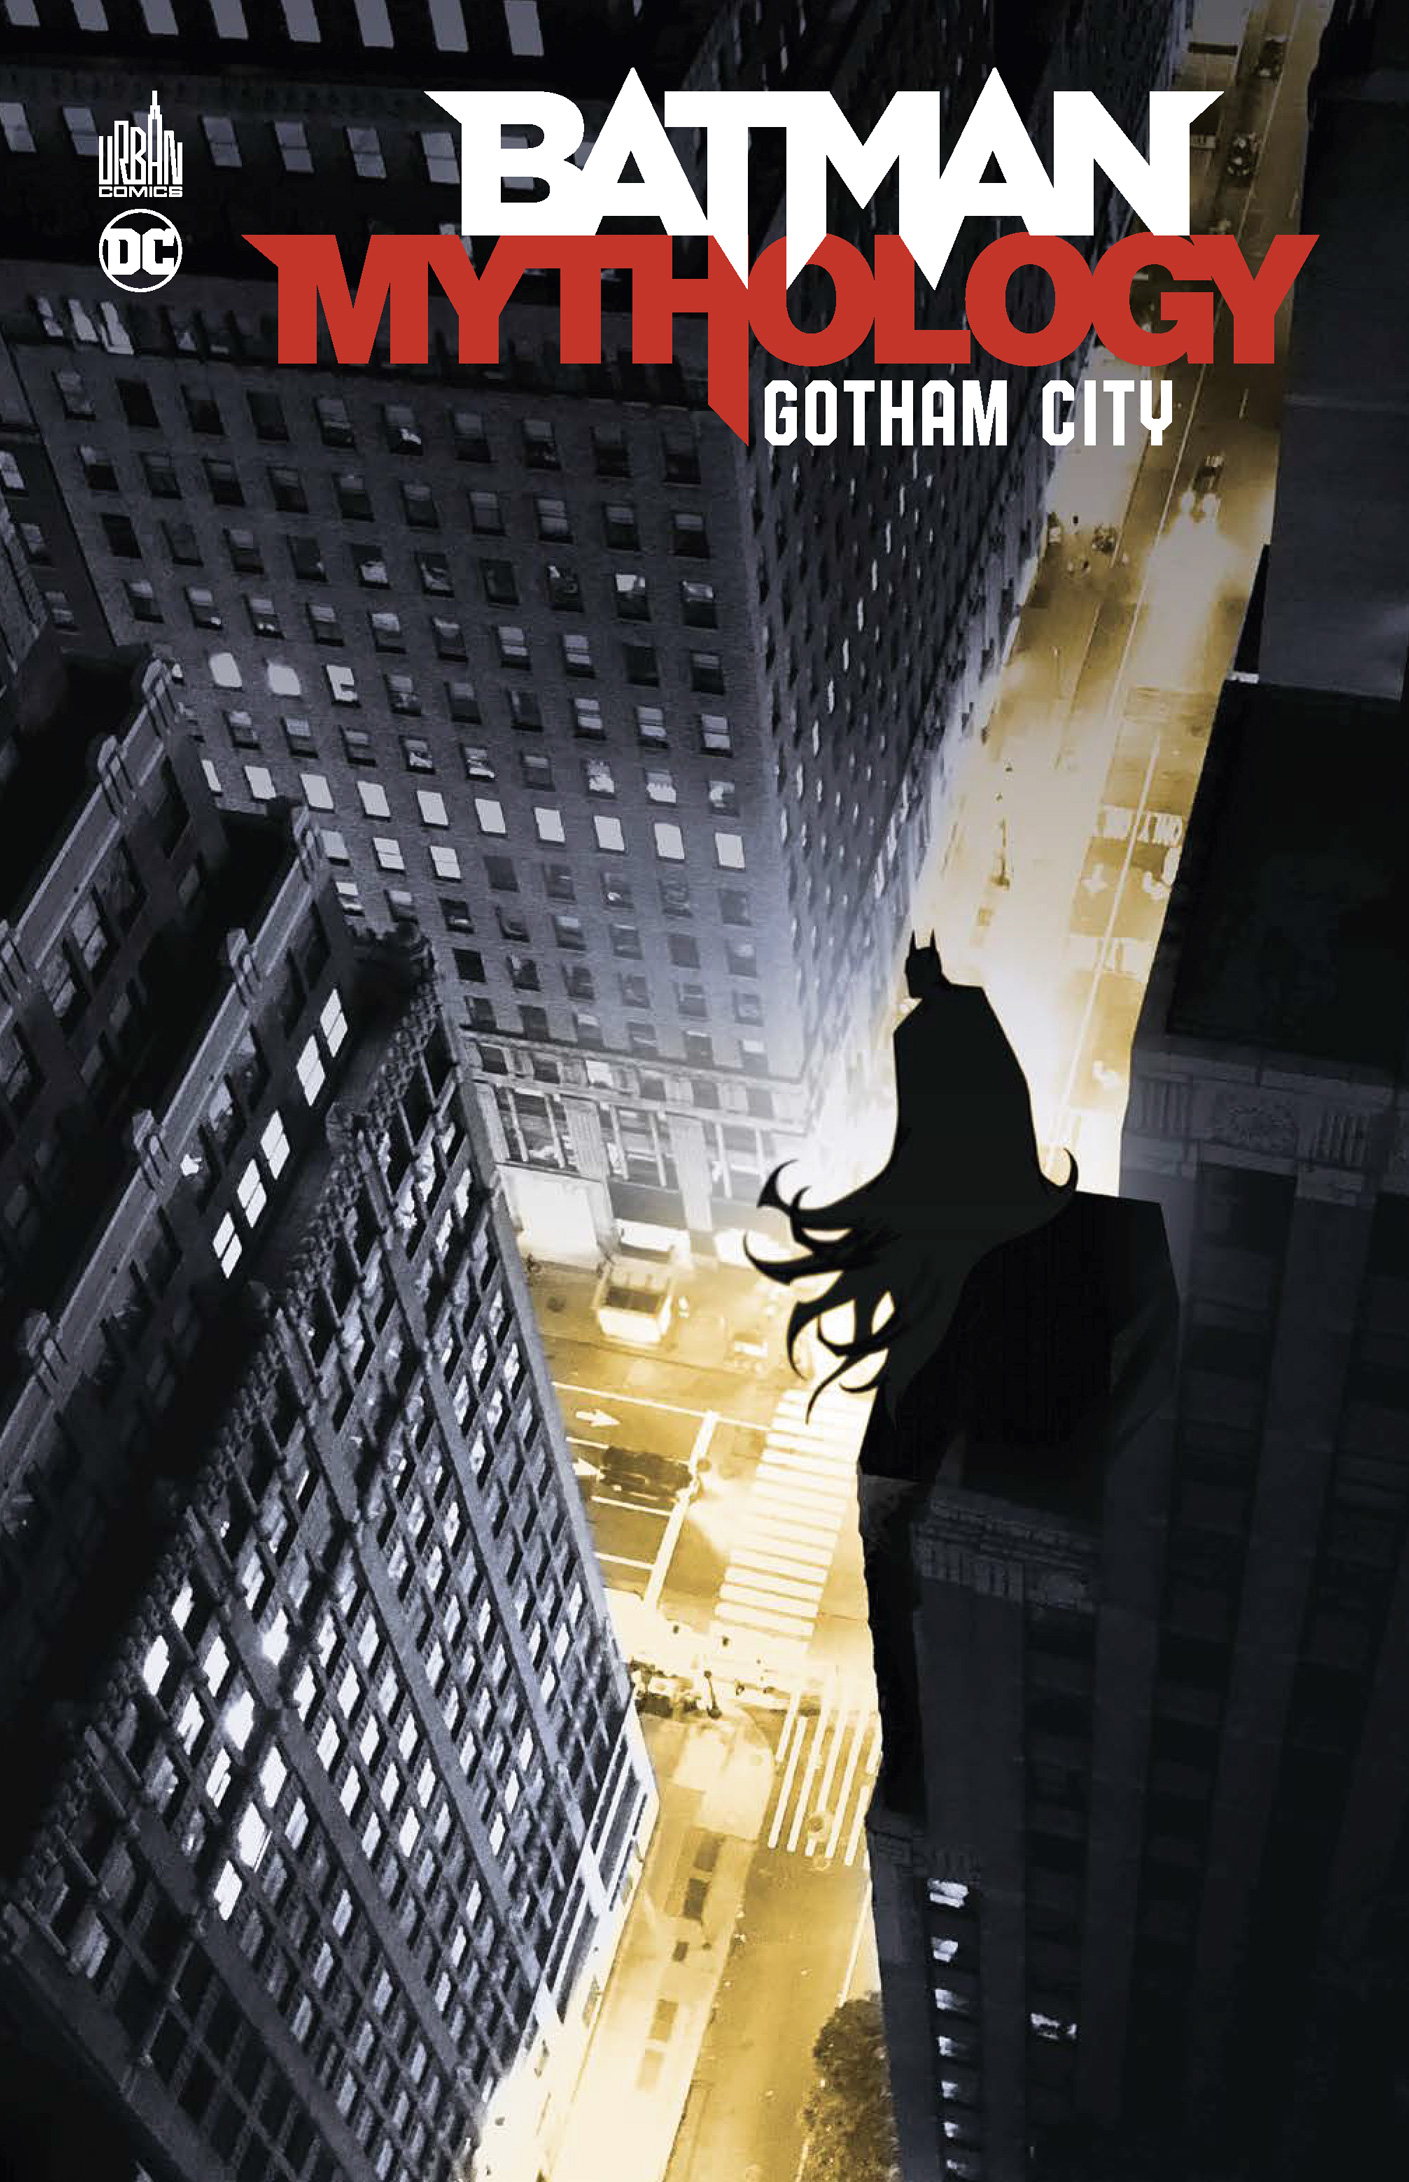 BATMAN MYTHOLOGY - TOME 2: GOTHAM CITY